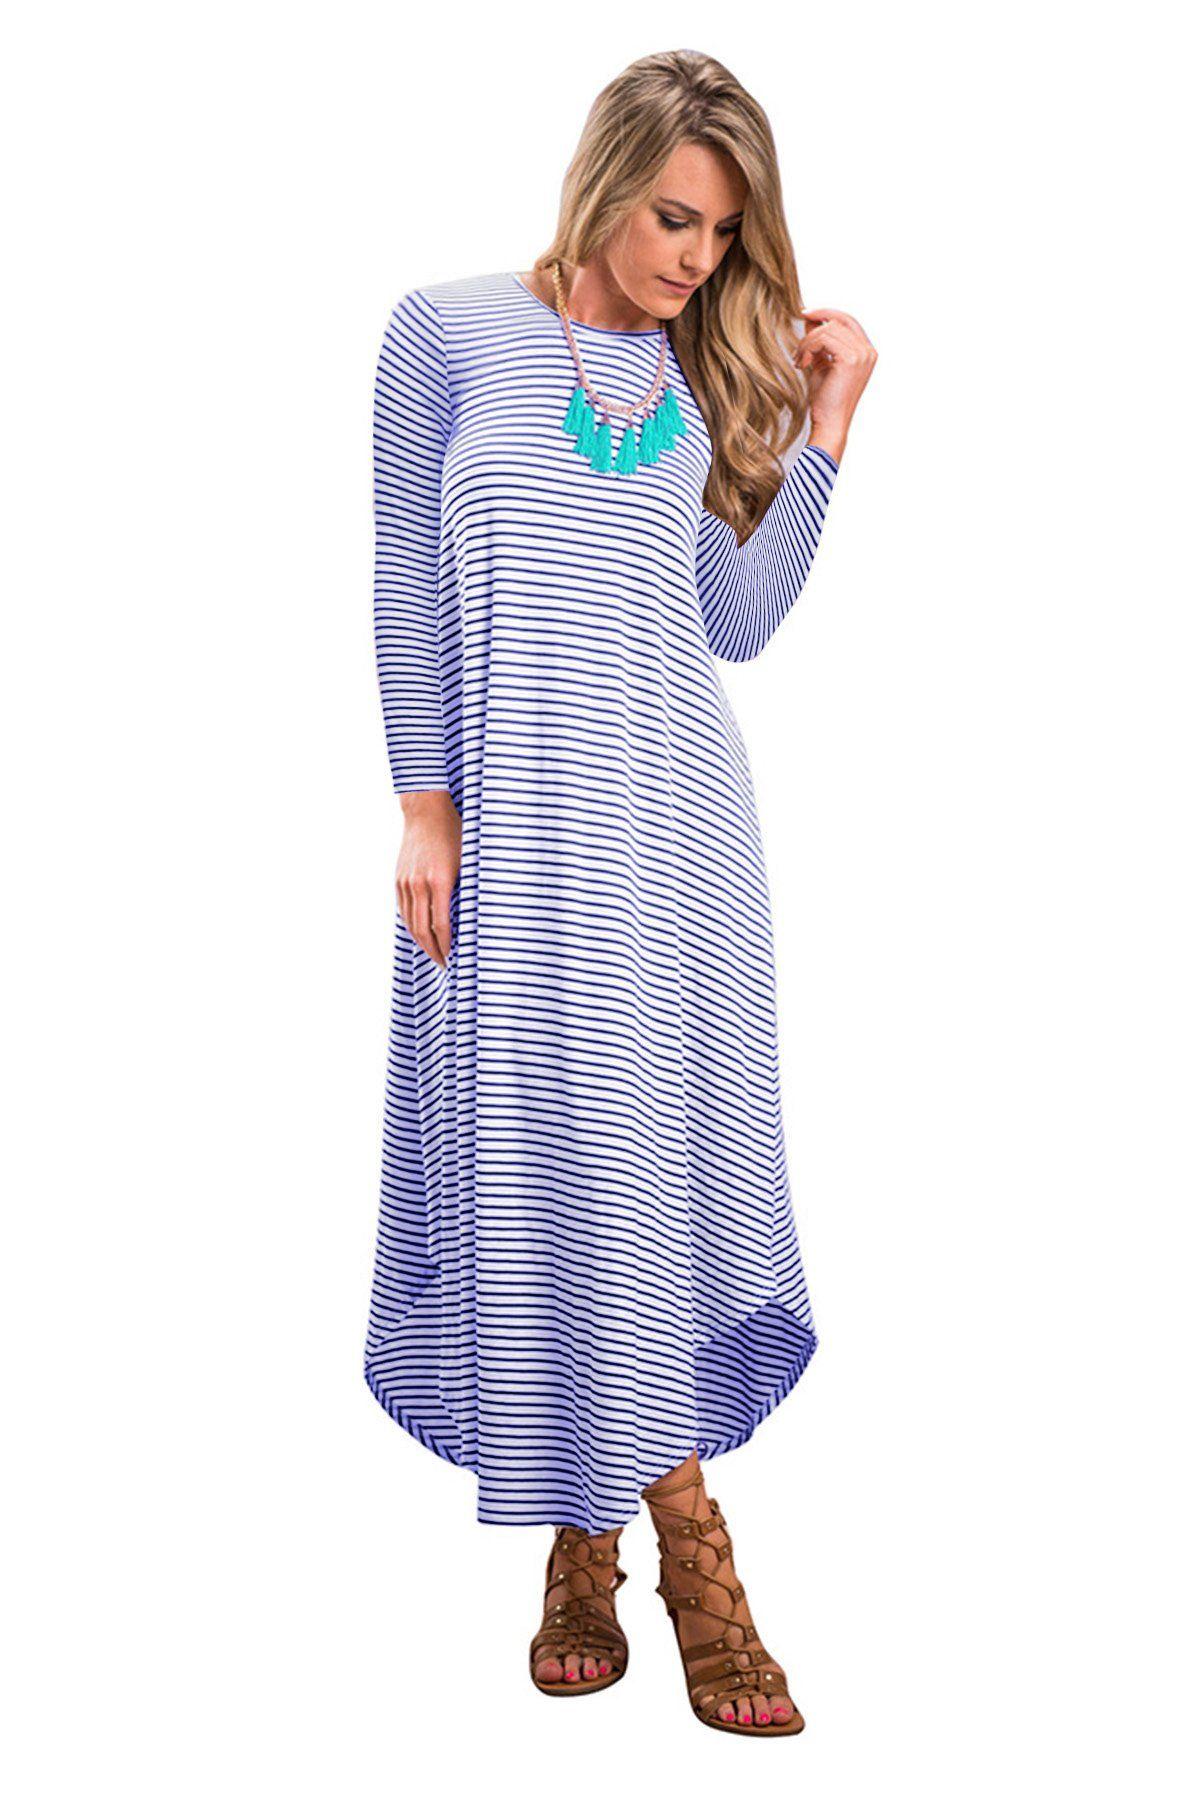 Women Maternity Clothes Jyuan Womens Striped Casual Dress Crew Neck Long Sleeve Loose Long Maxi Dress Striped Casual Dresses Long Maxi Dress Casual Dress [ 1800 x 1200 Pixel ]